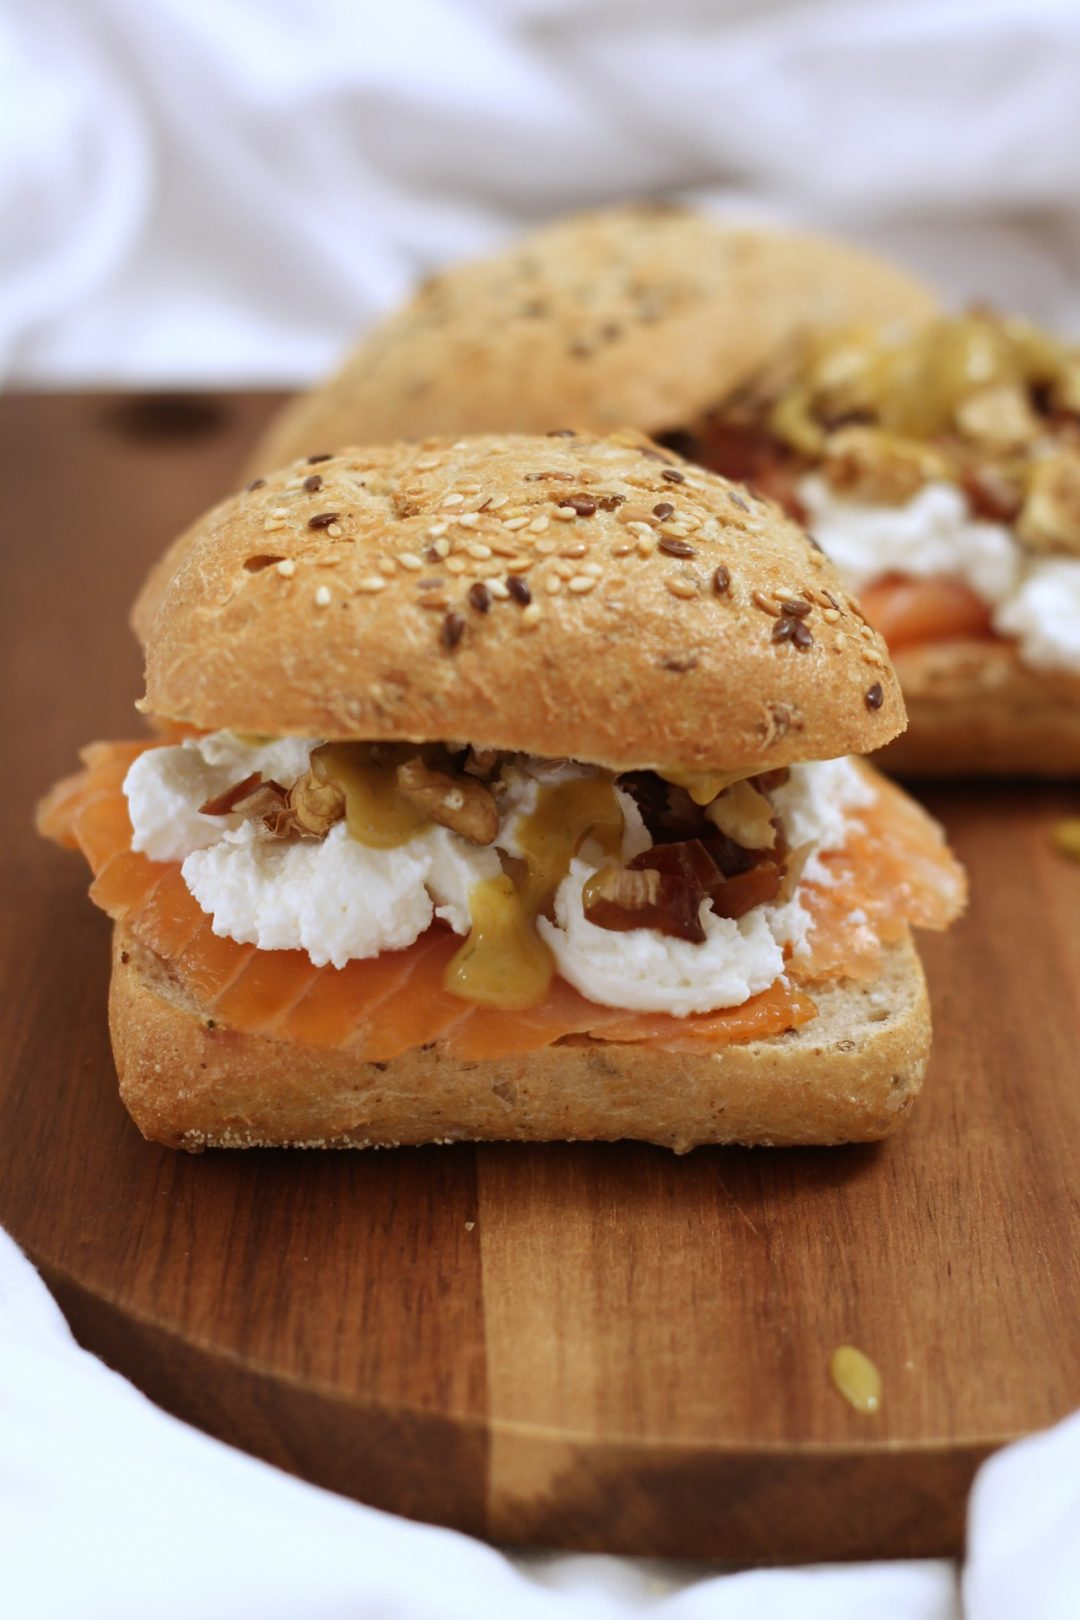 panino-salmone-ricotta-datteri-e-noci